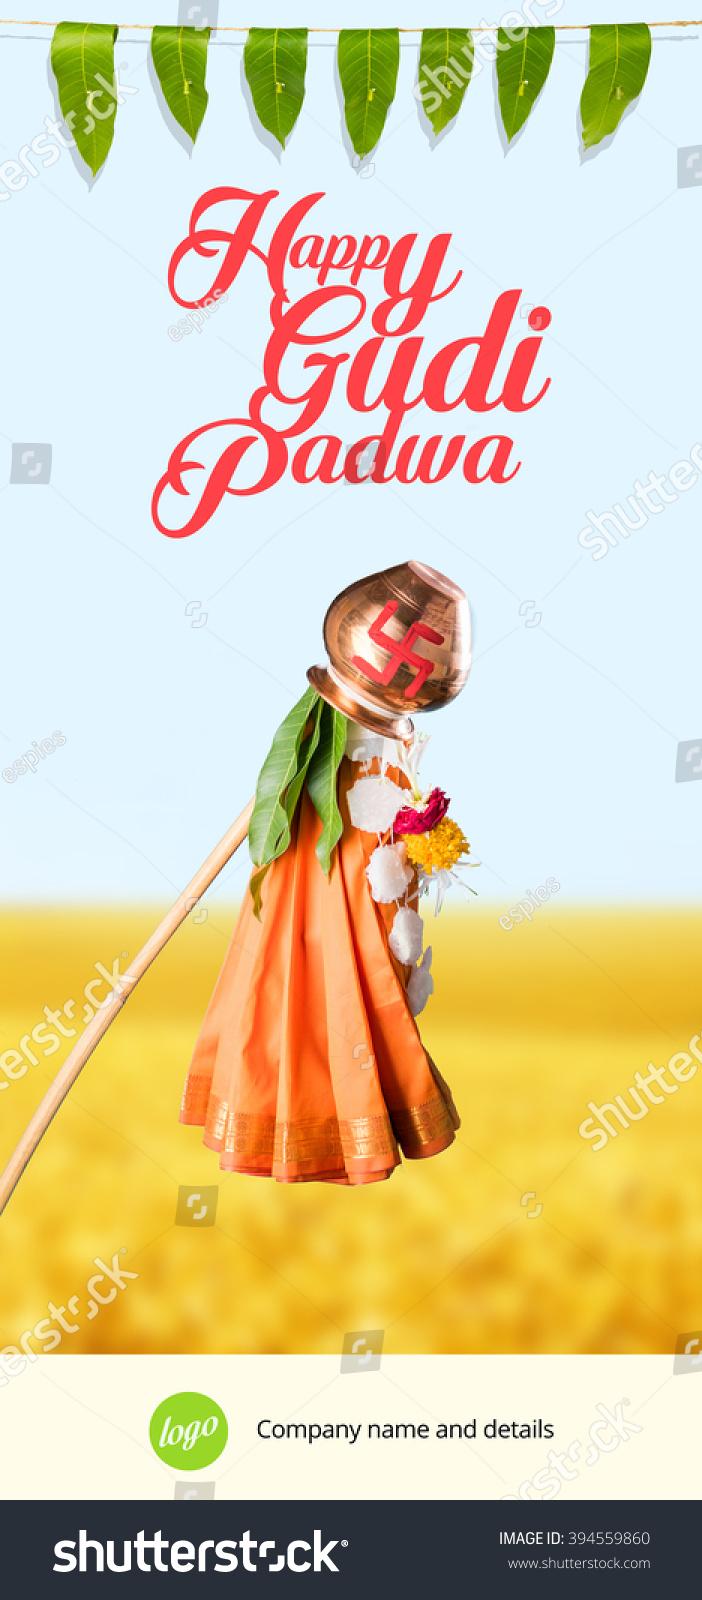 Royalty Free Happy Gudi Padwa Greeting Its A 394559860 Stock